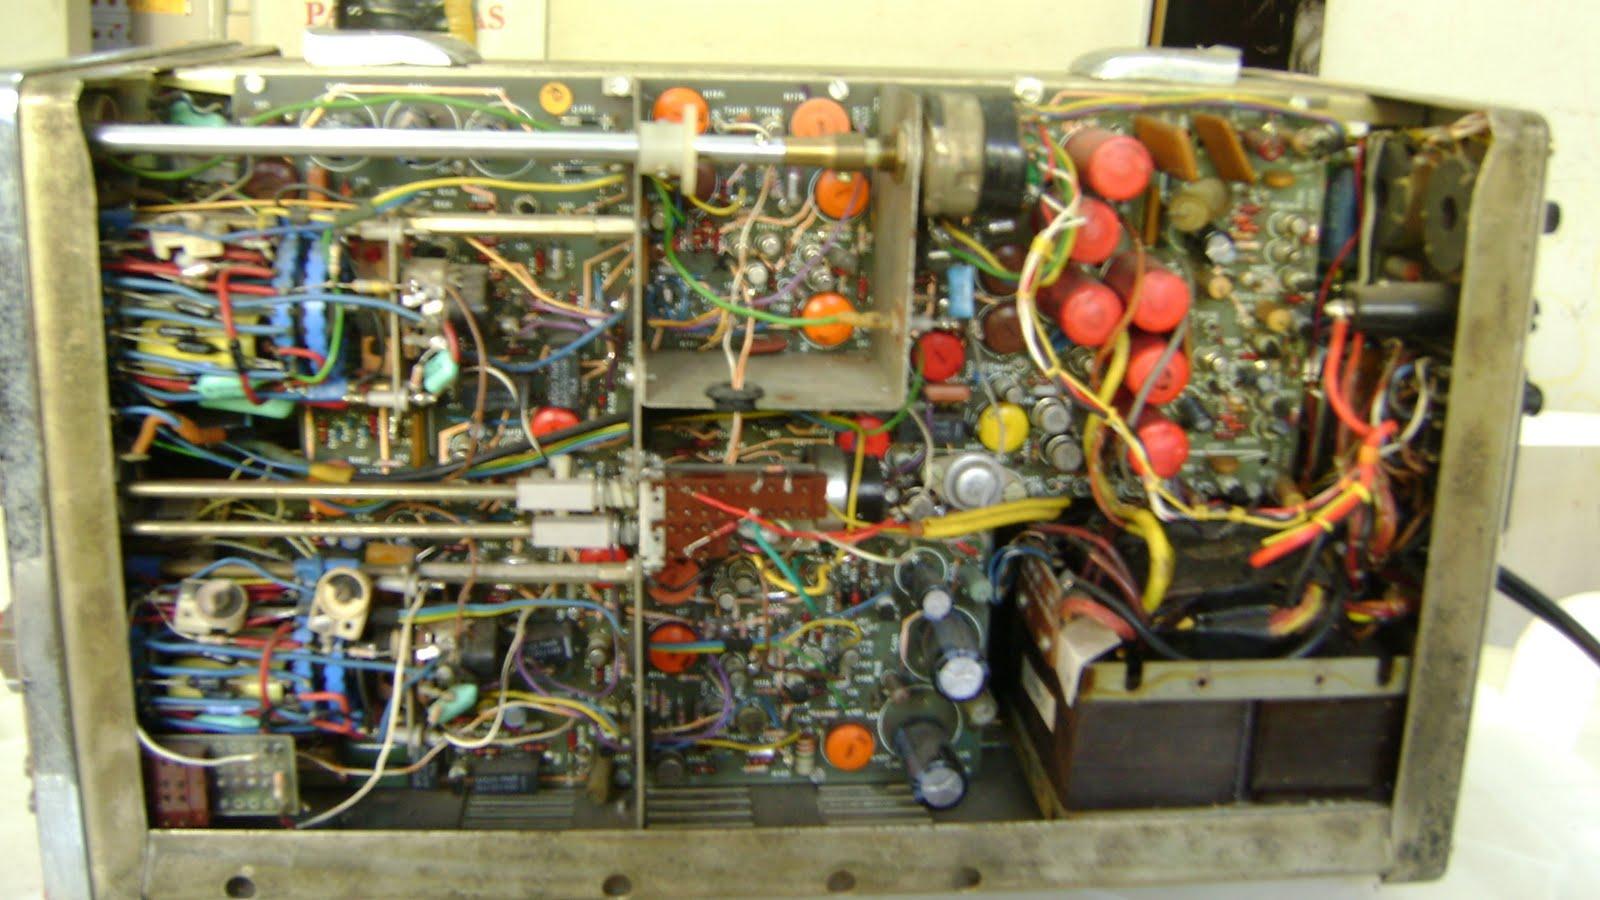 Eletrônica na bancada: Osciloscópio Telequipment D67 / Como funciona  #A65A25 1600x900